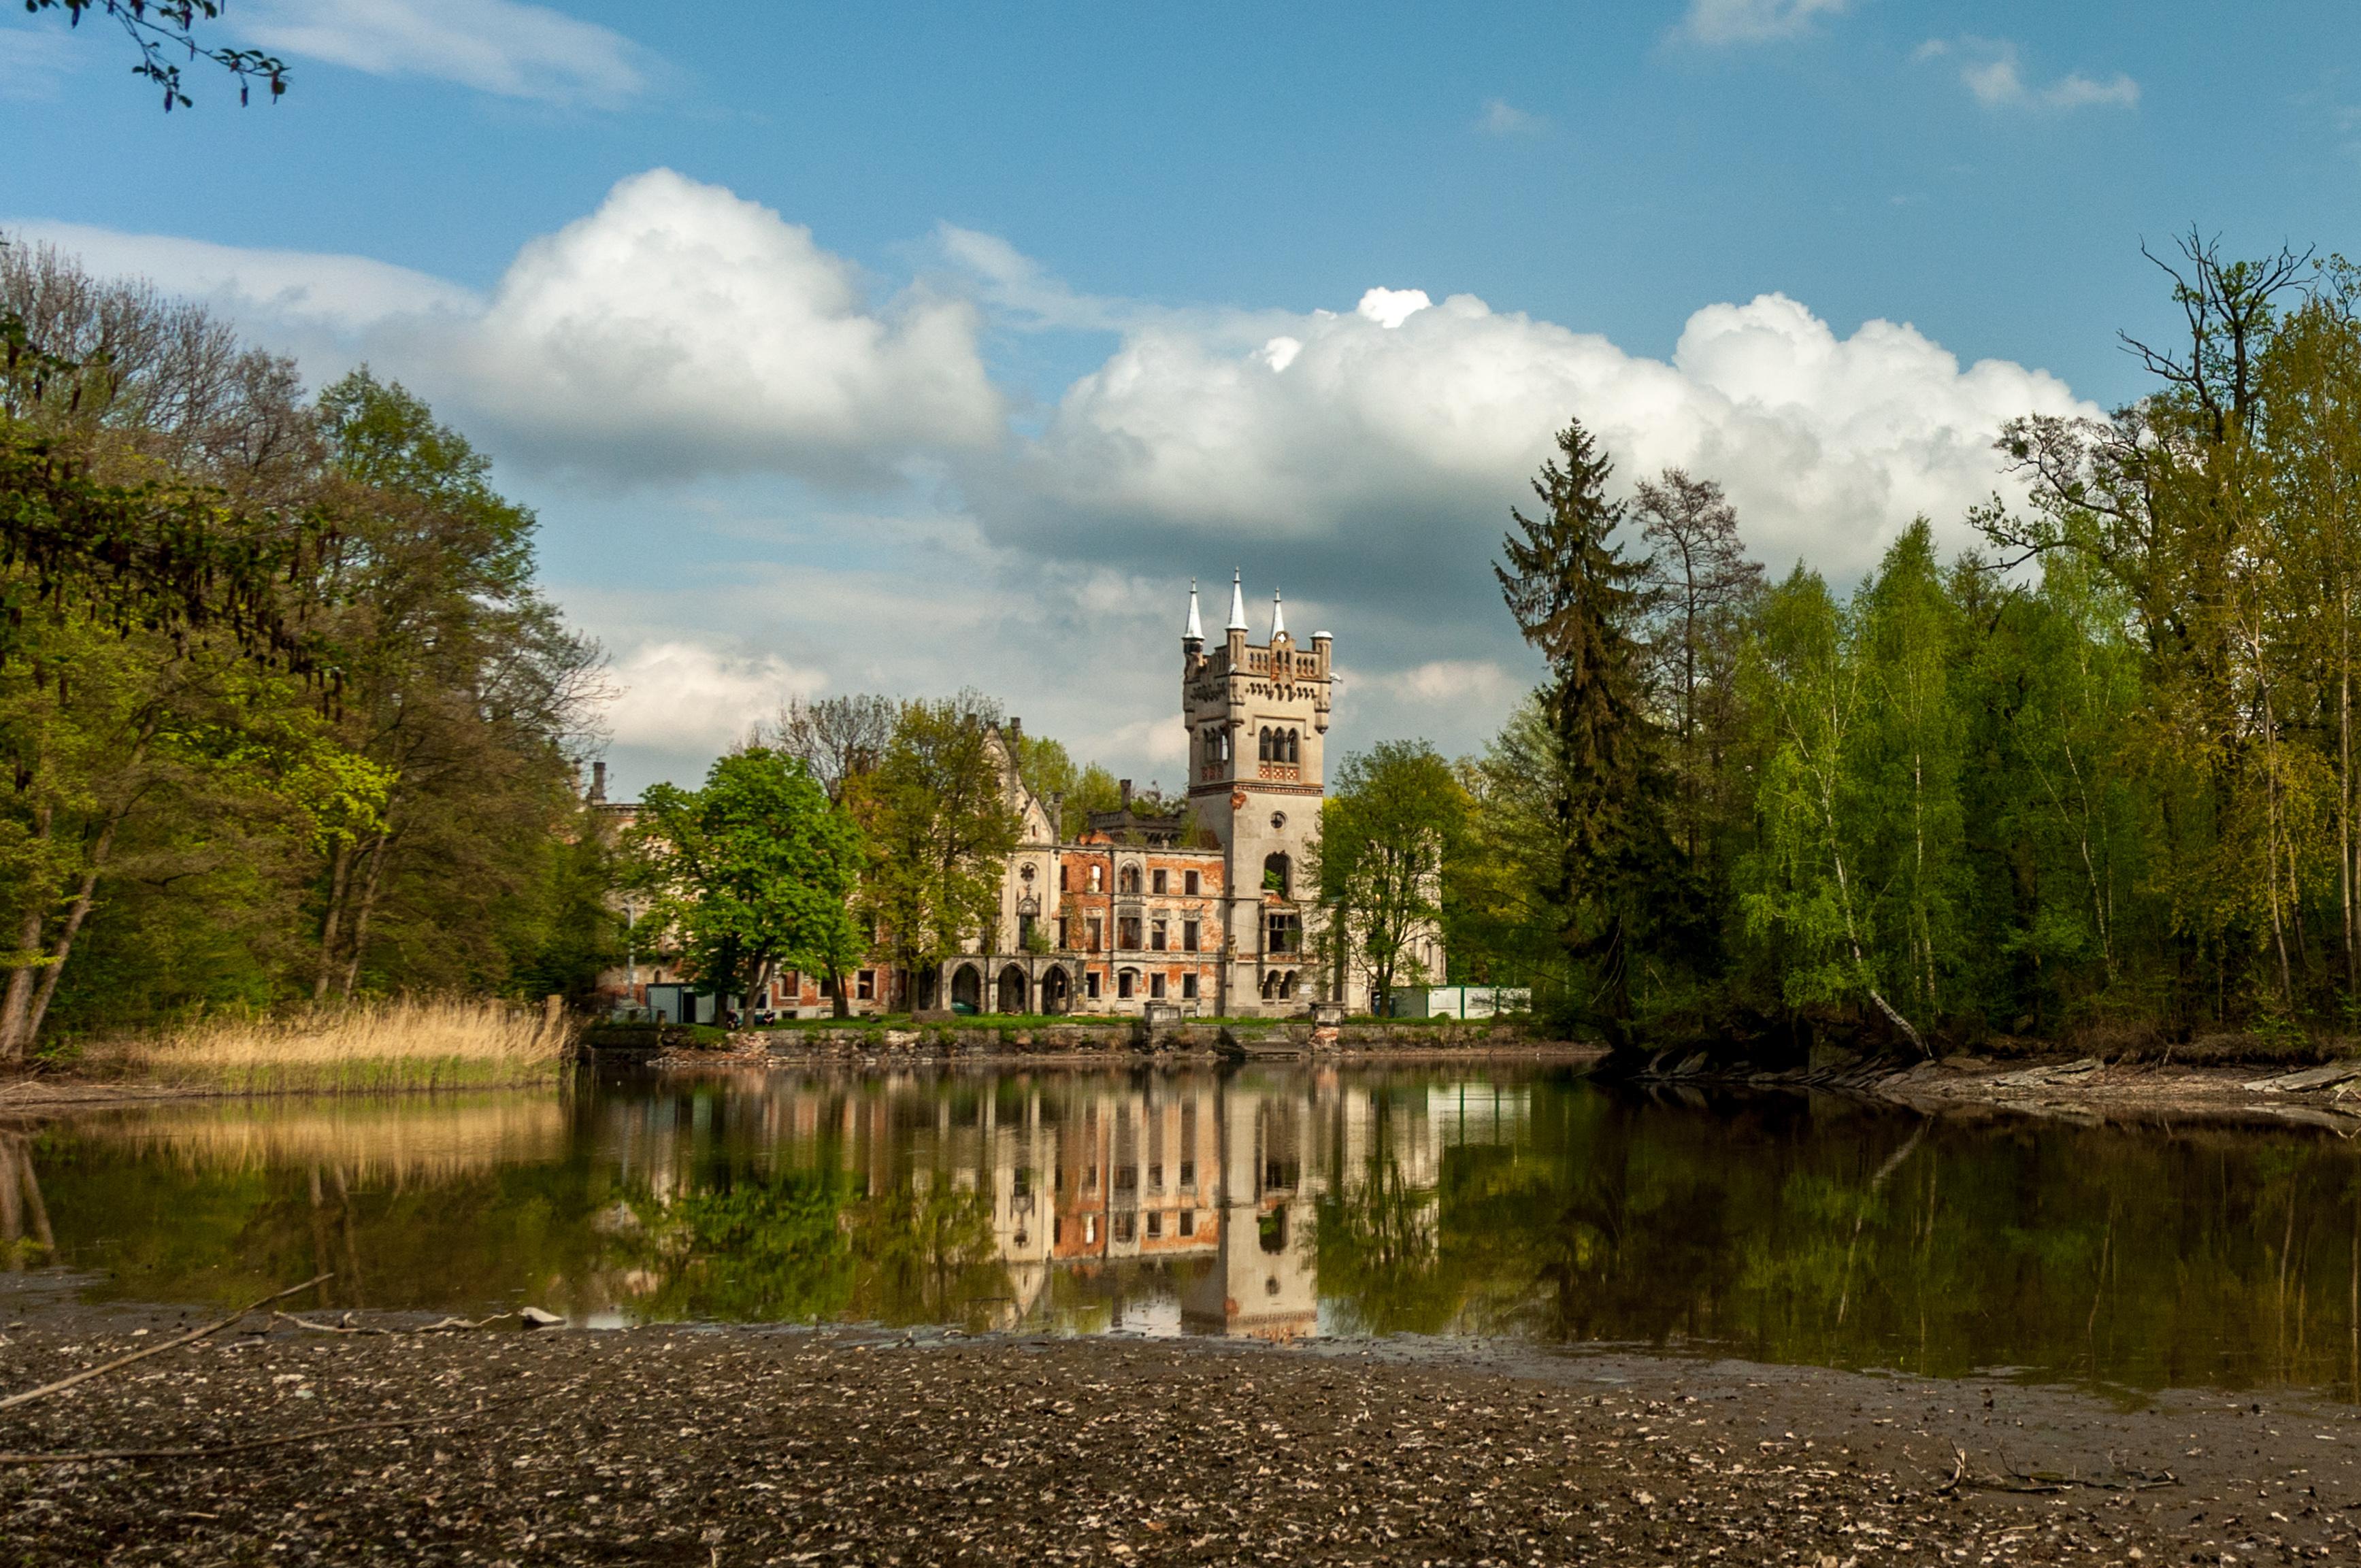 File:Kopice Pałac, 1864, nr ID 609946, 01.jpg - Wikimedia